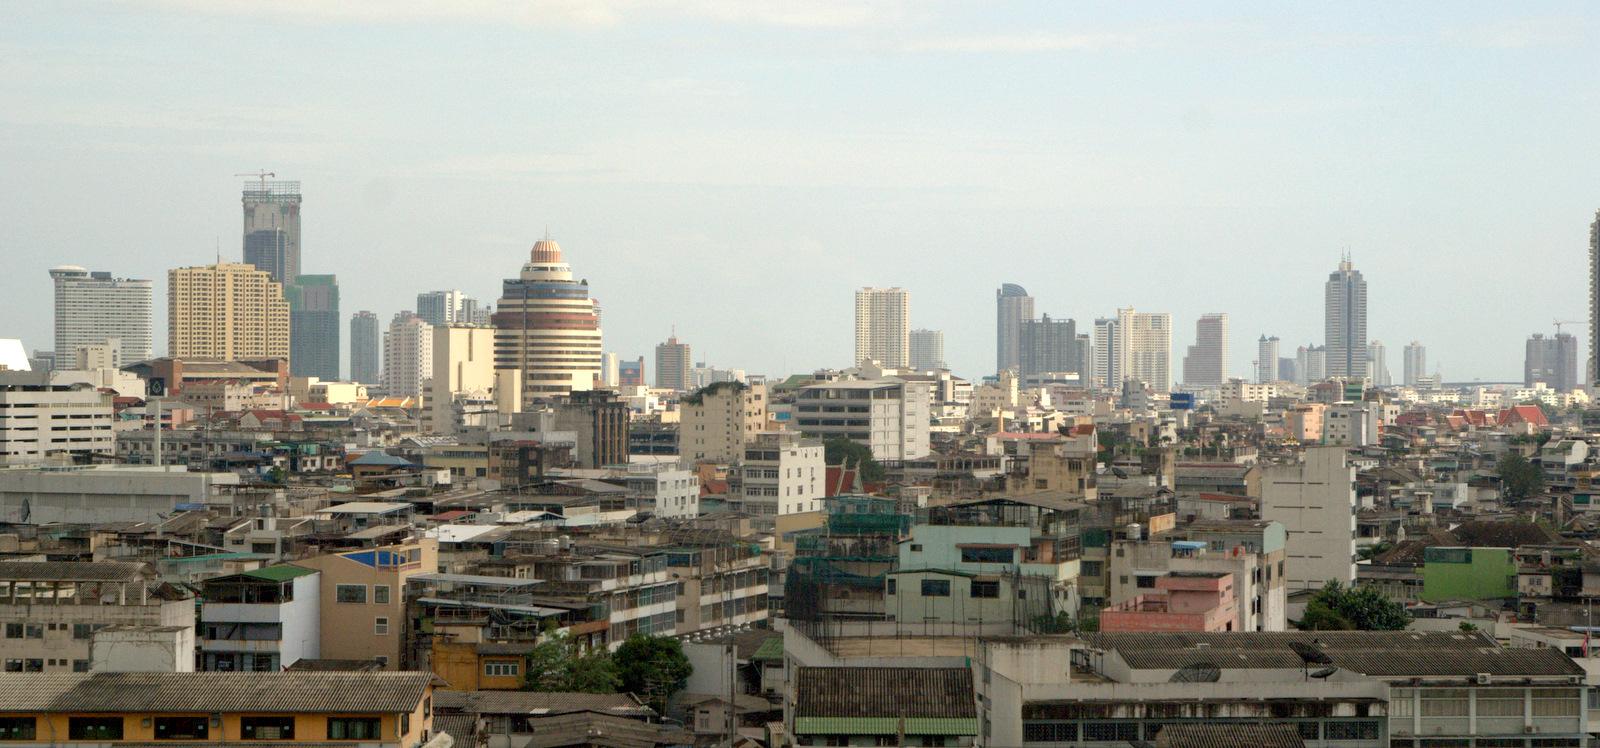 Bangkok (ostatni spacer autobusem i rzeką) 1